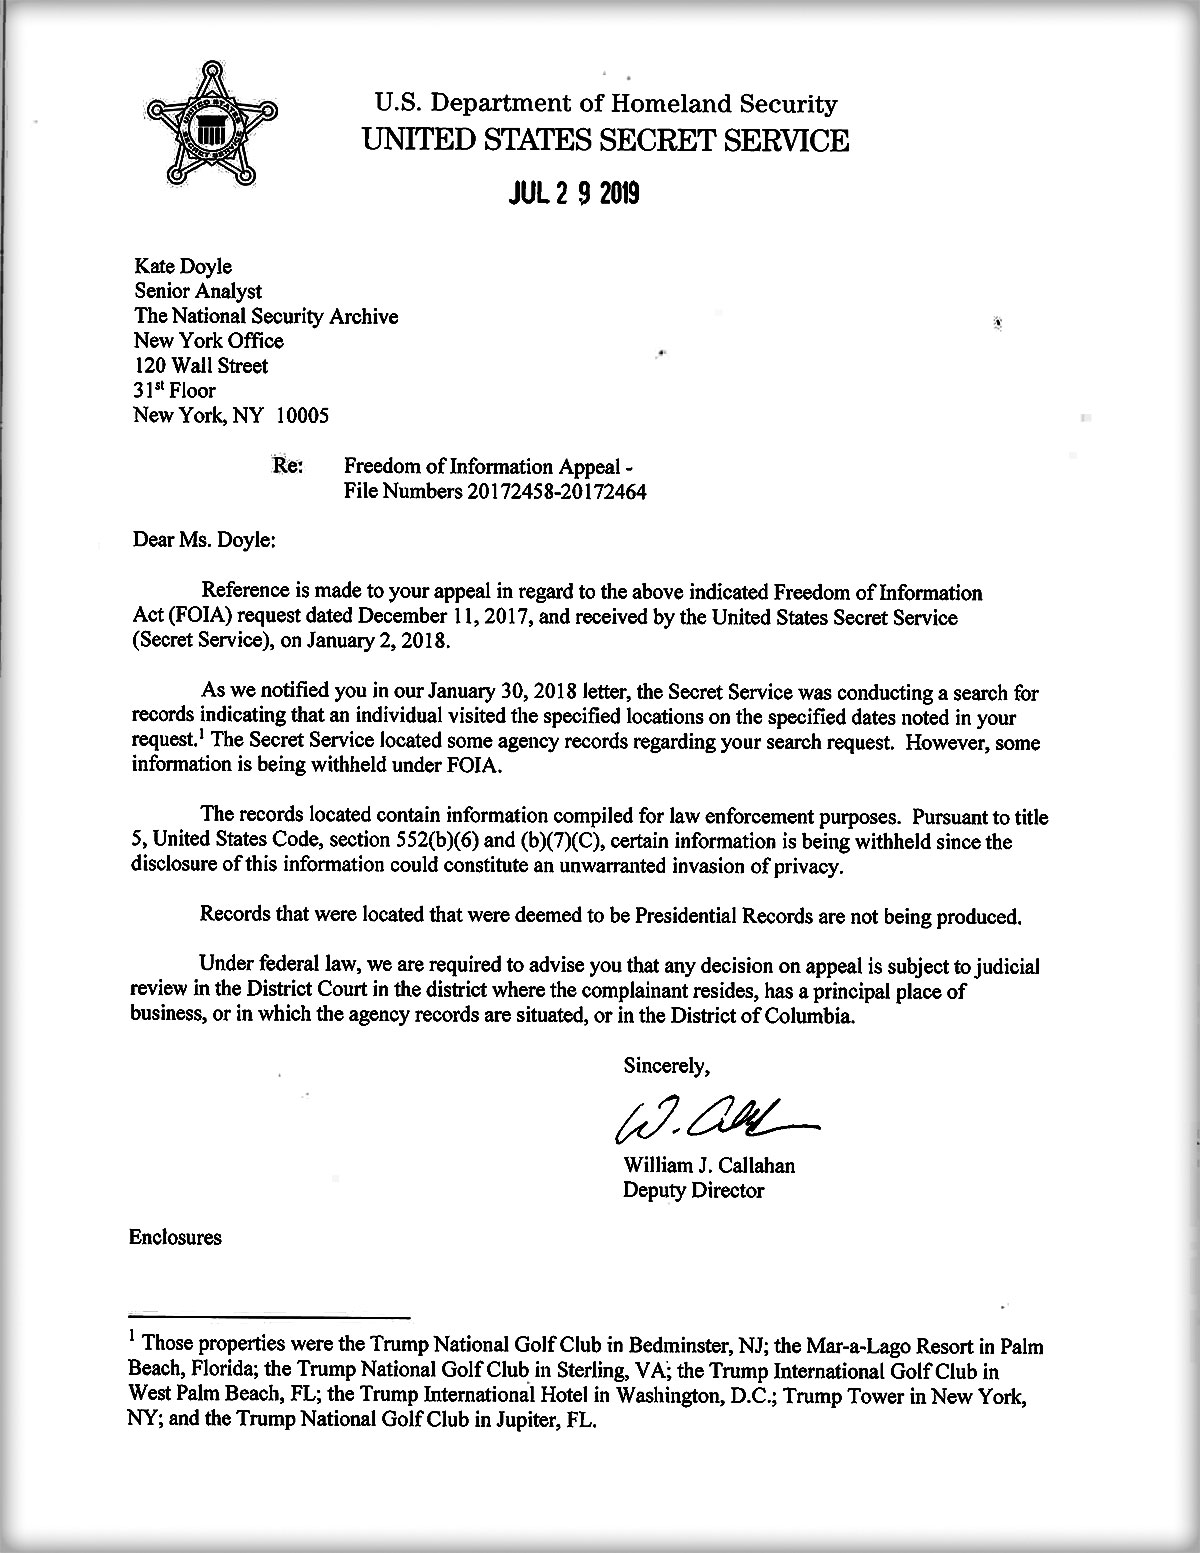 Secret Service response to Archive's December 11, 2017 FOIA Appeal